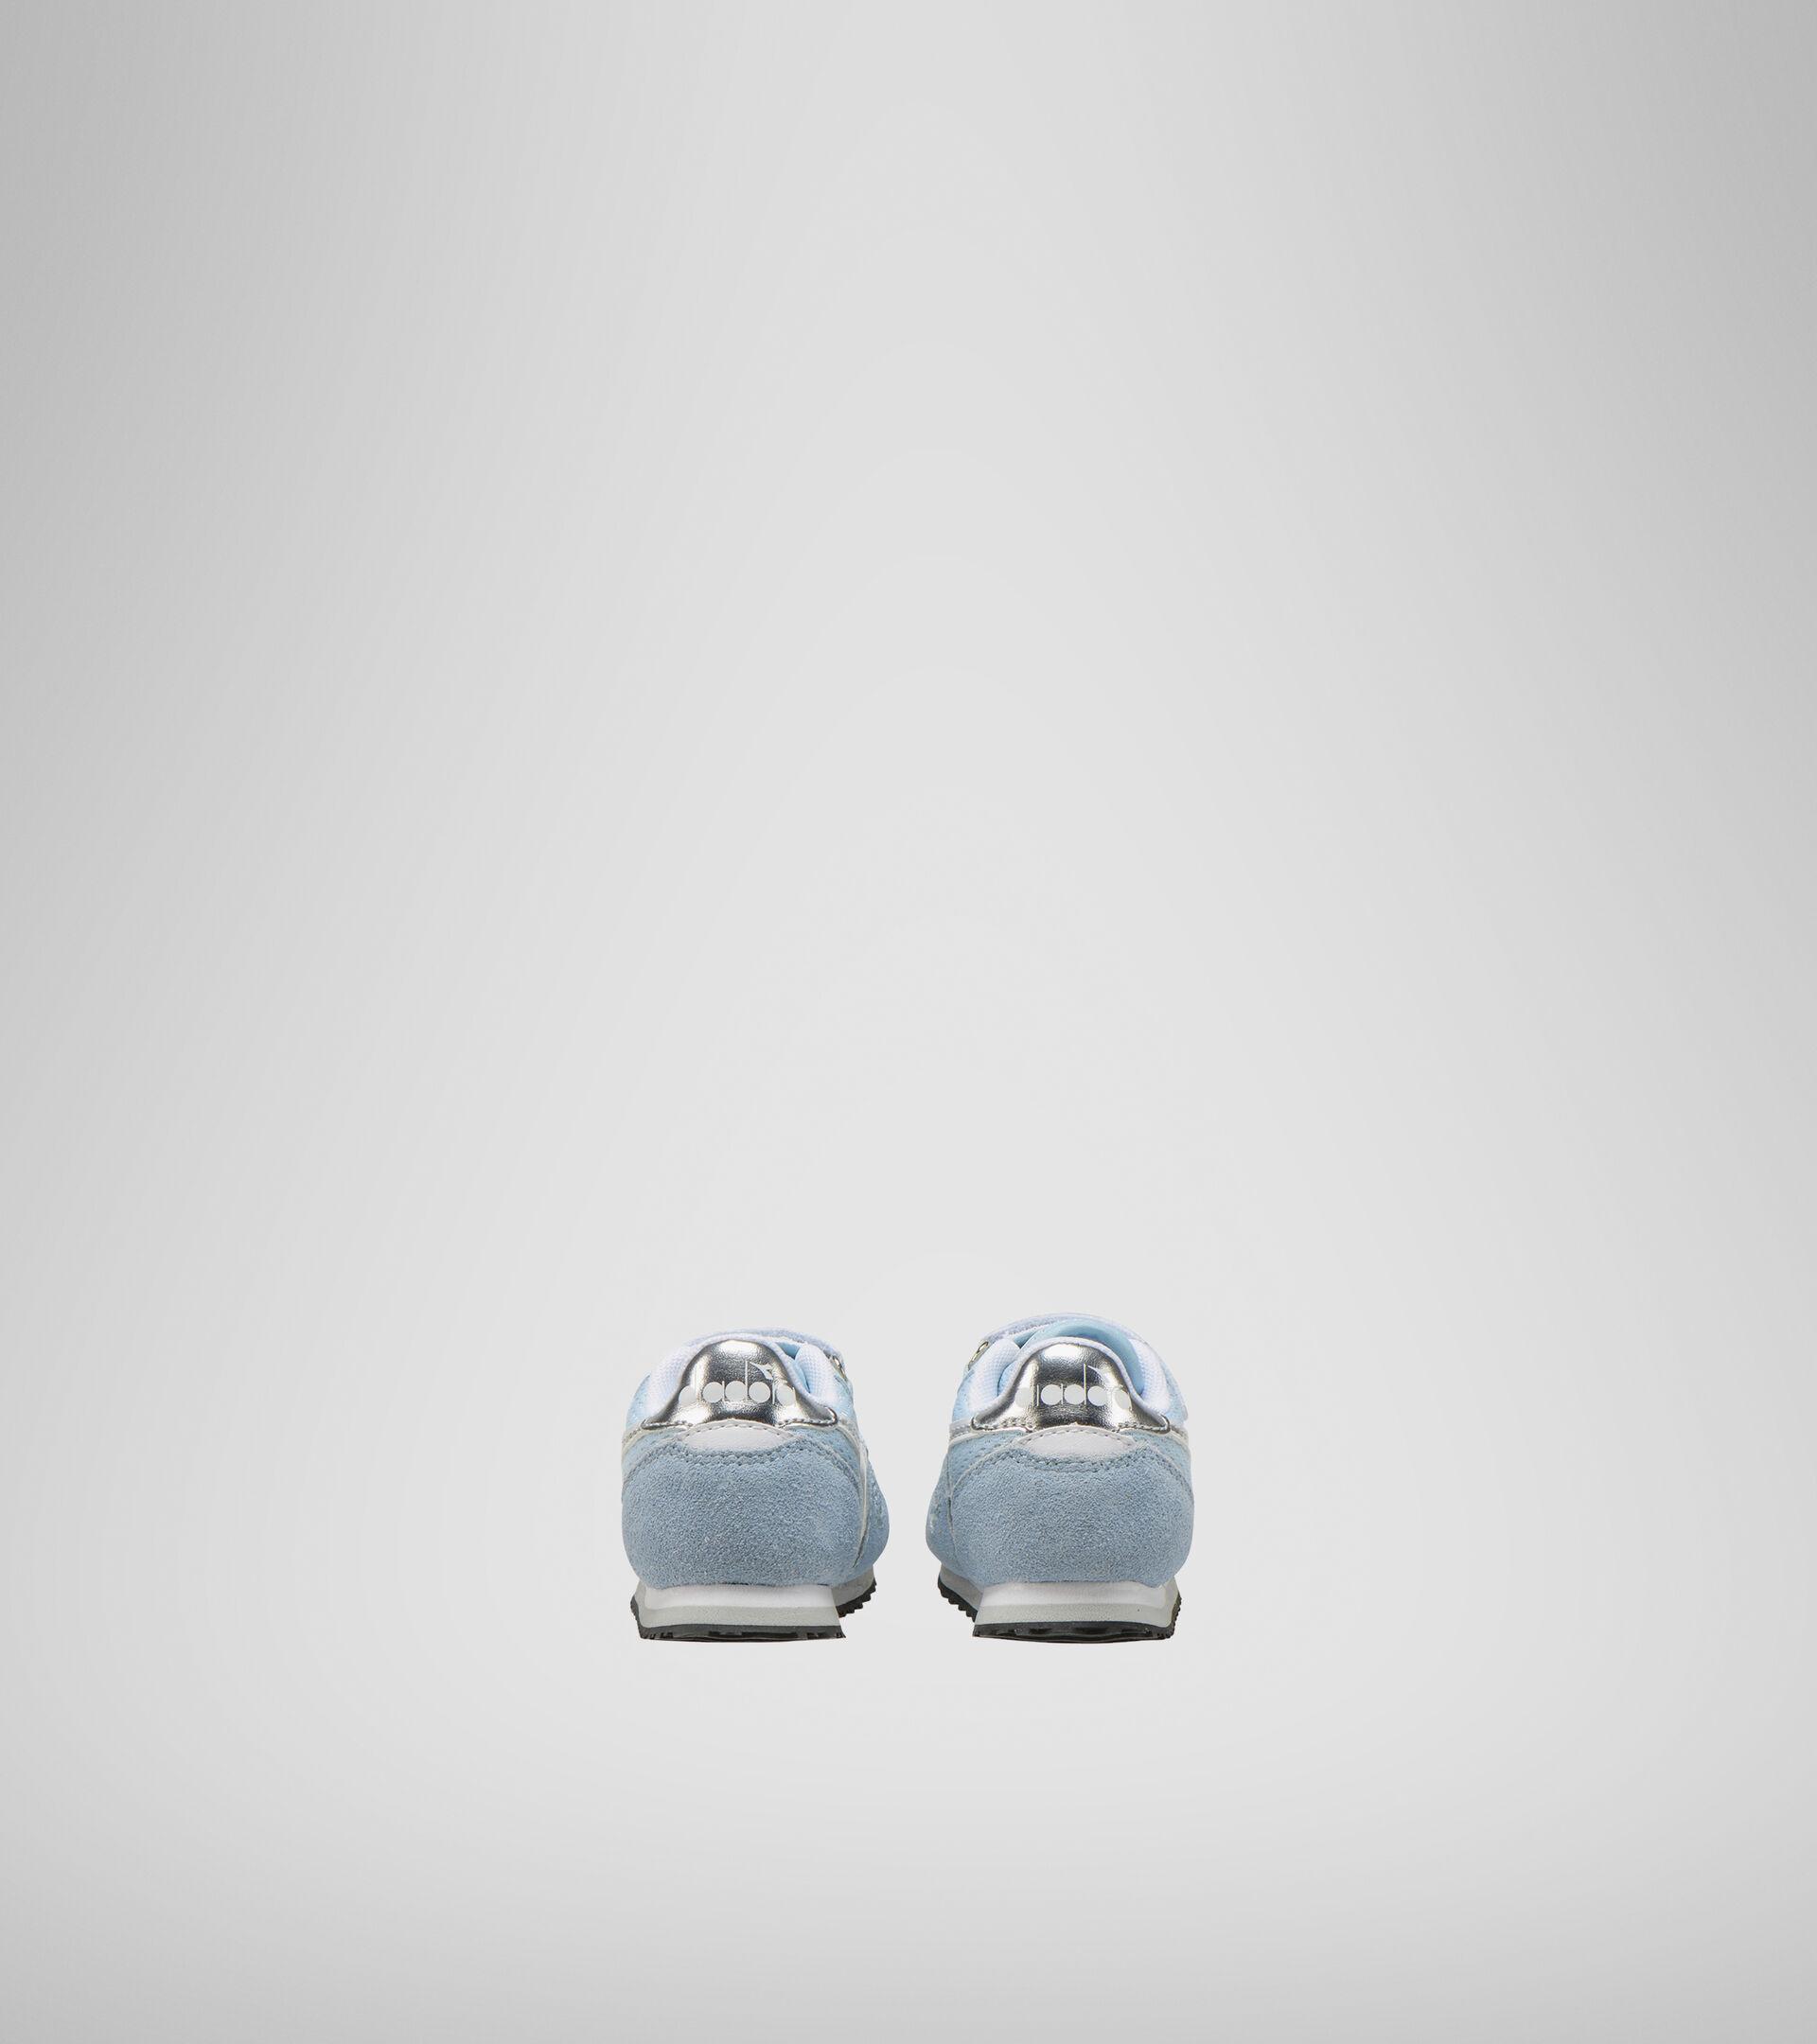 Chaussures de sport - Bambins 1-4 ans SIMPLE RUN TD GIRL BLEU LUMIERE DES ETOILES - Diadora